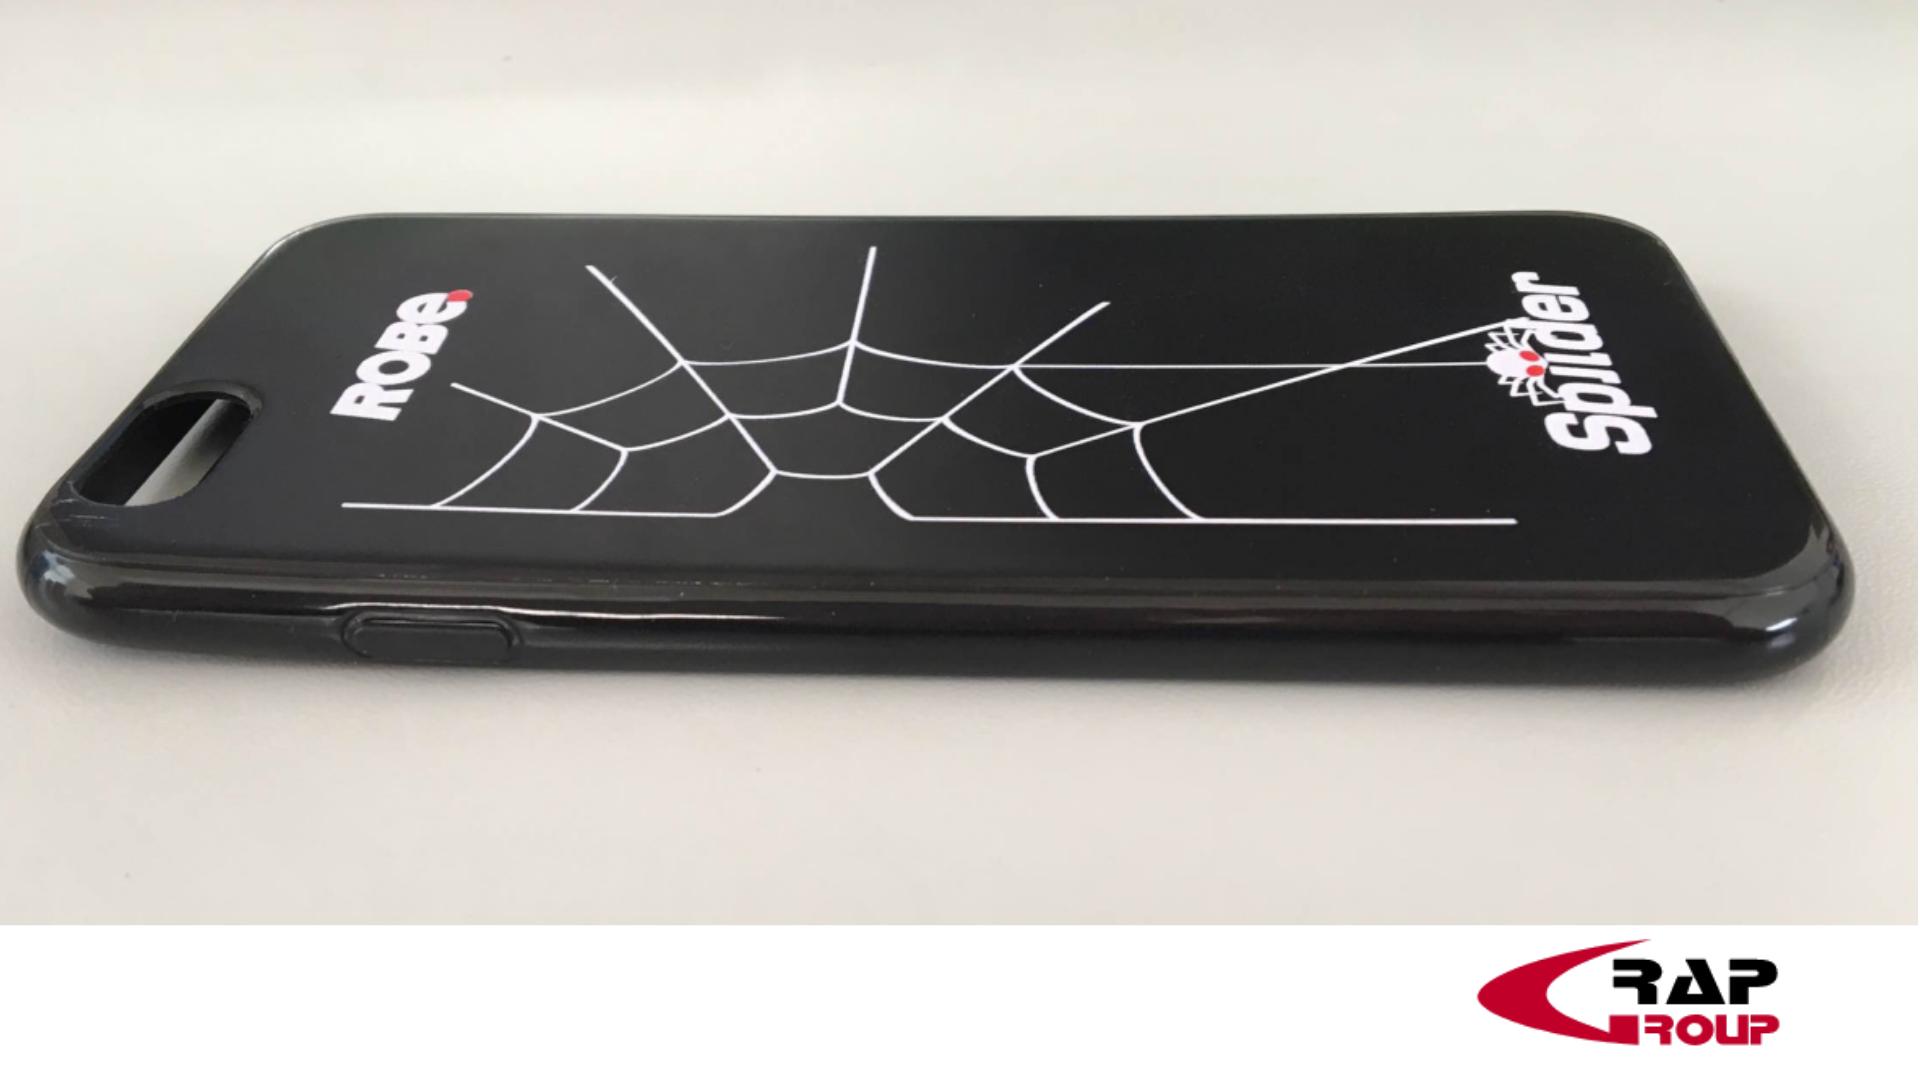 Reklamní dárek na nový vizuál SPIDER firmy ROBE